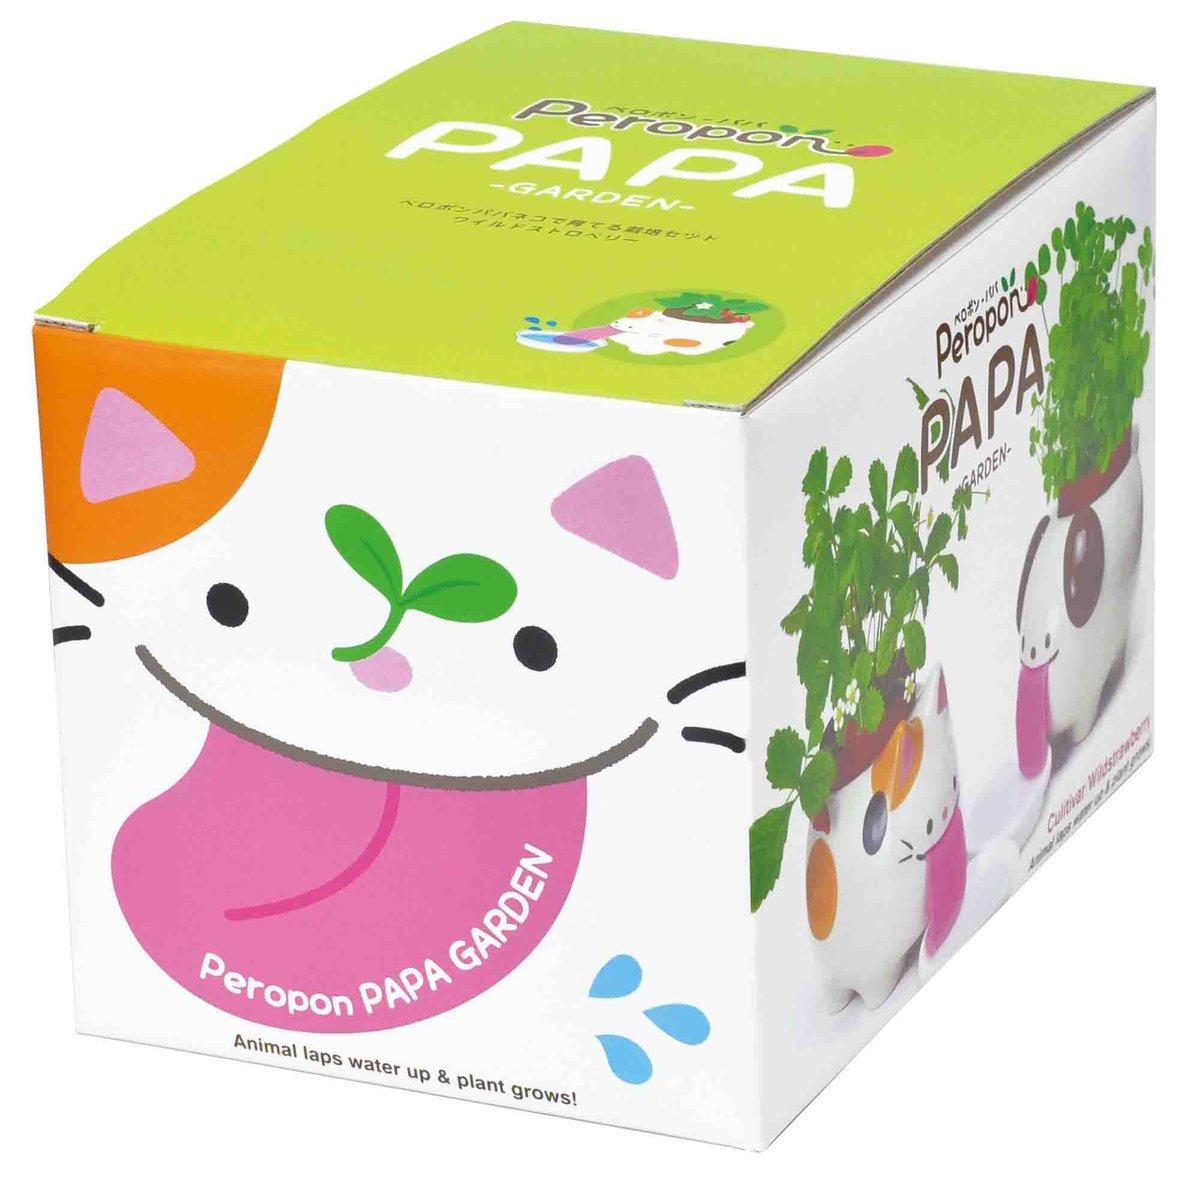 Peropon PAPA 自動吸水小盆栽 - 小貓/野草莓